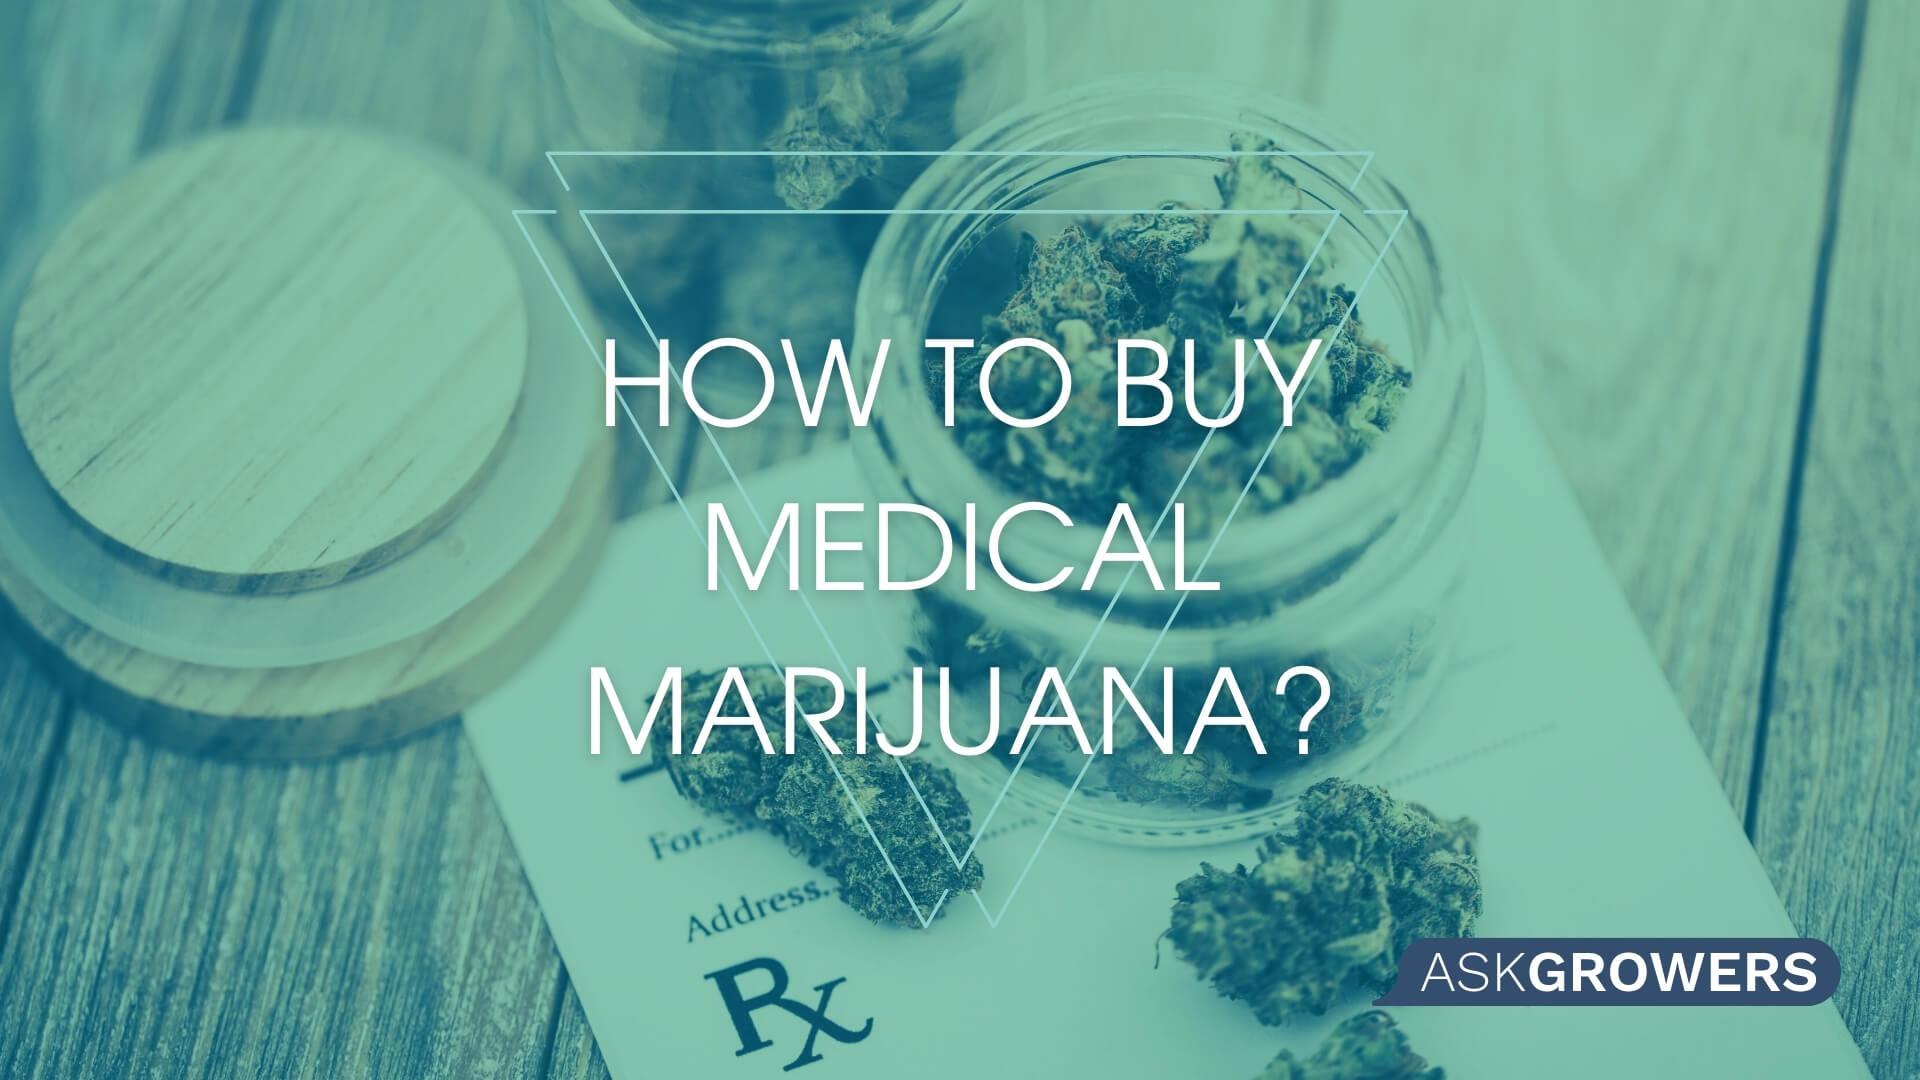 How to Buy Medical Marijuana?, AskGrowers